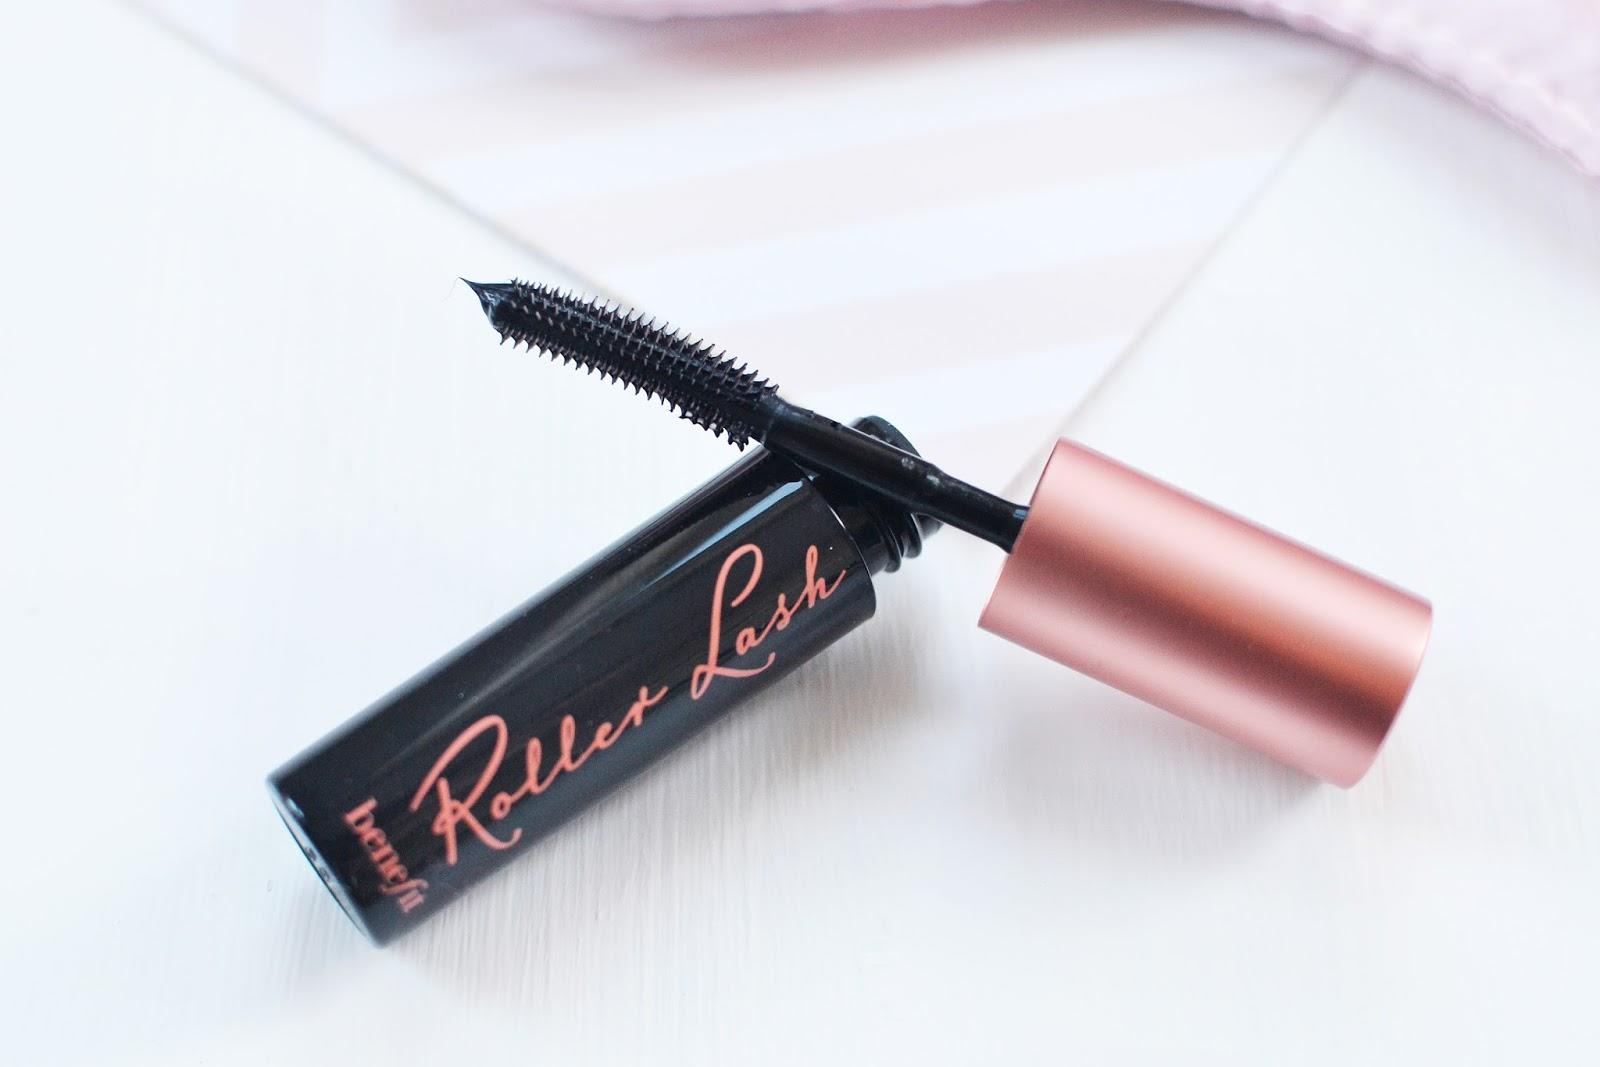 Benefit's Roller Lash Mascara